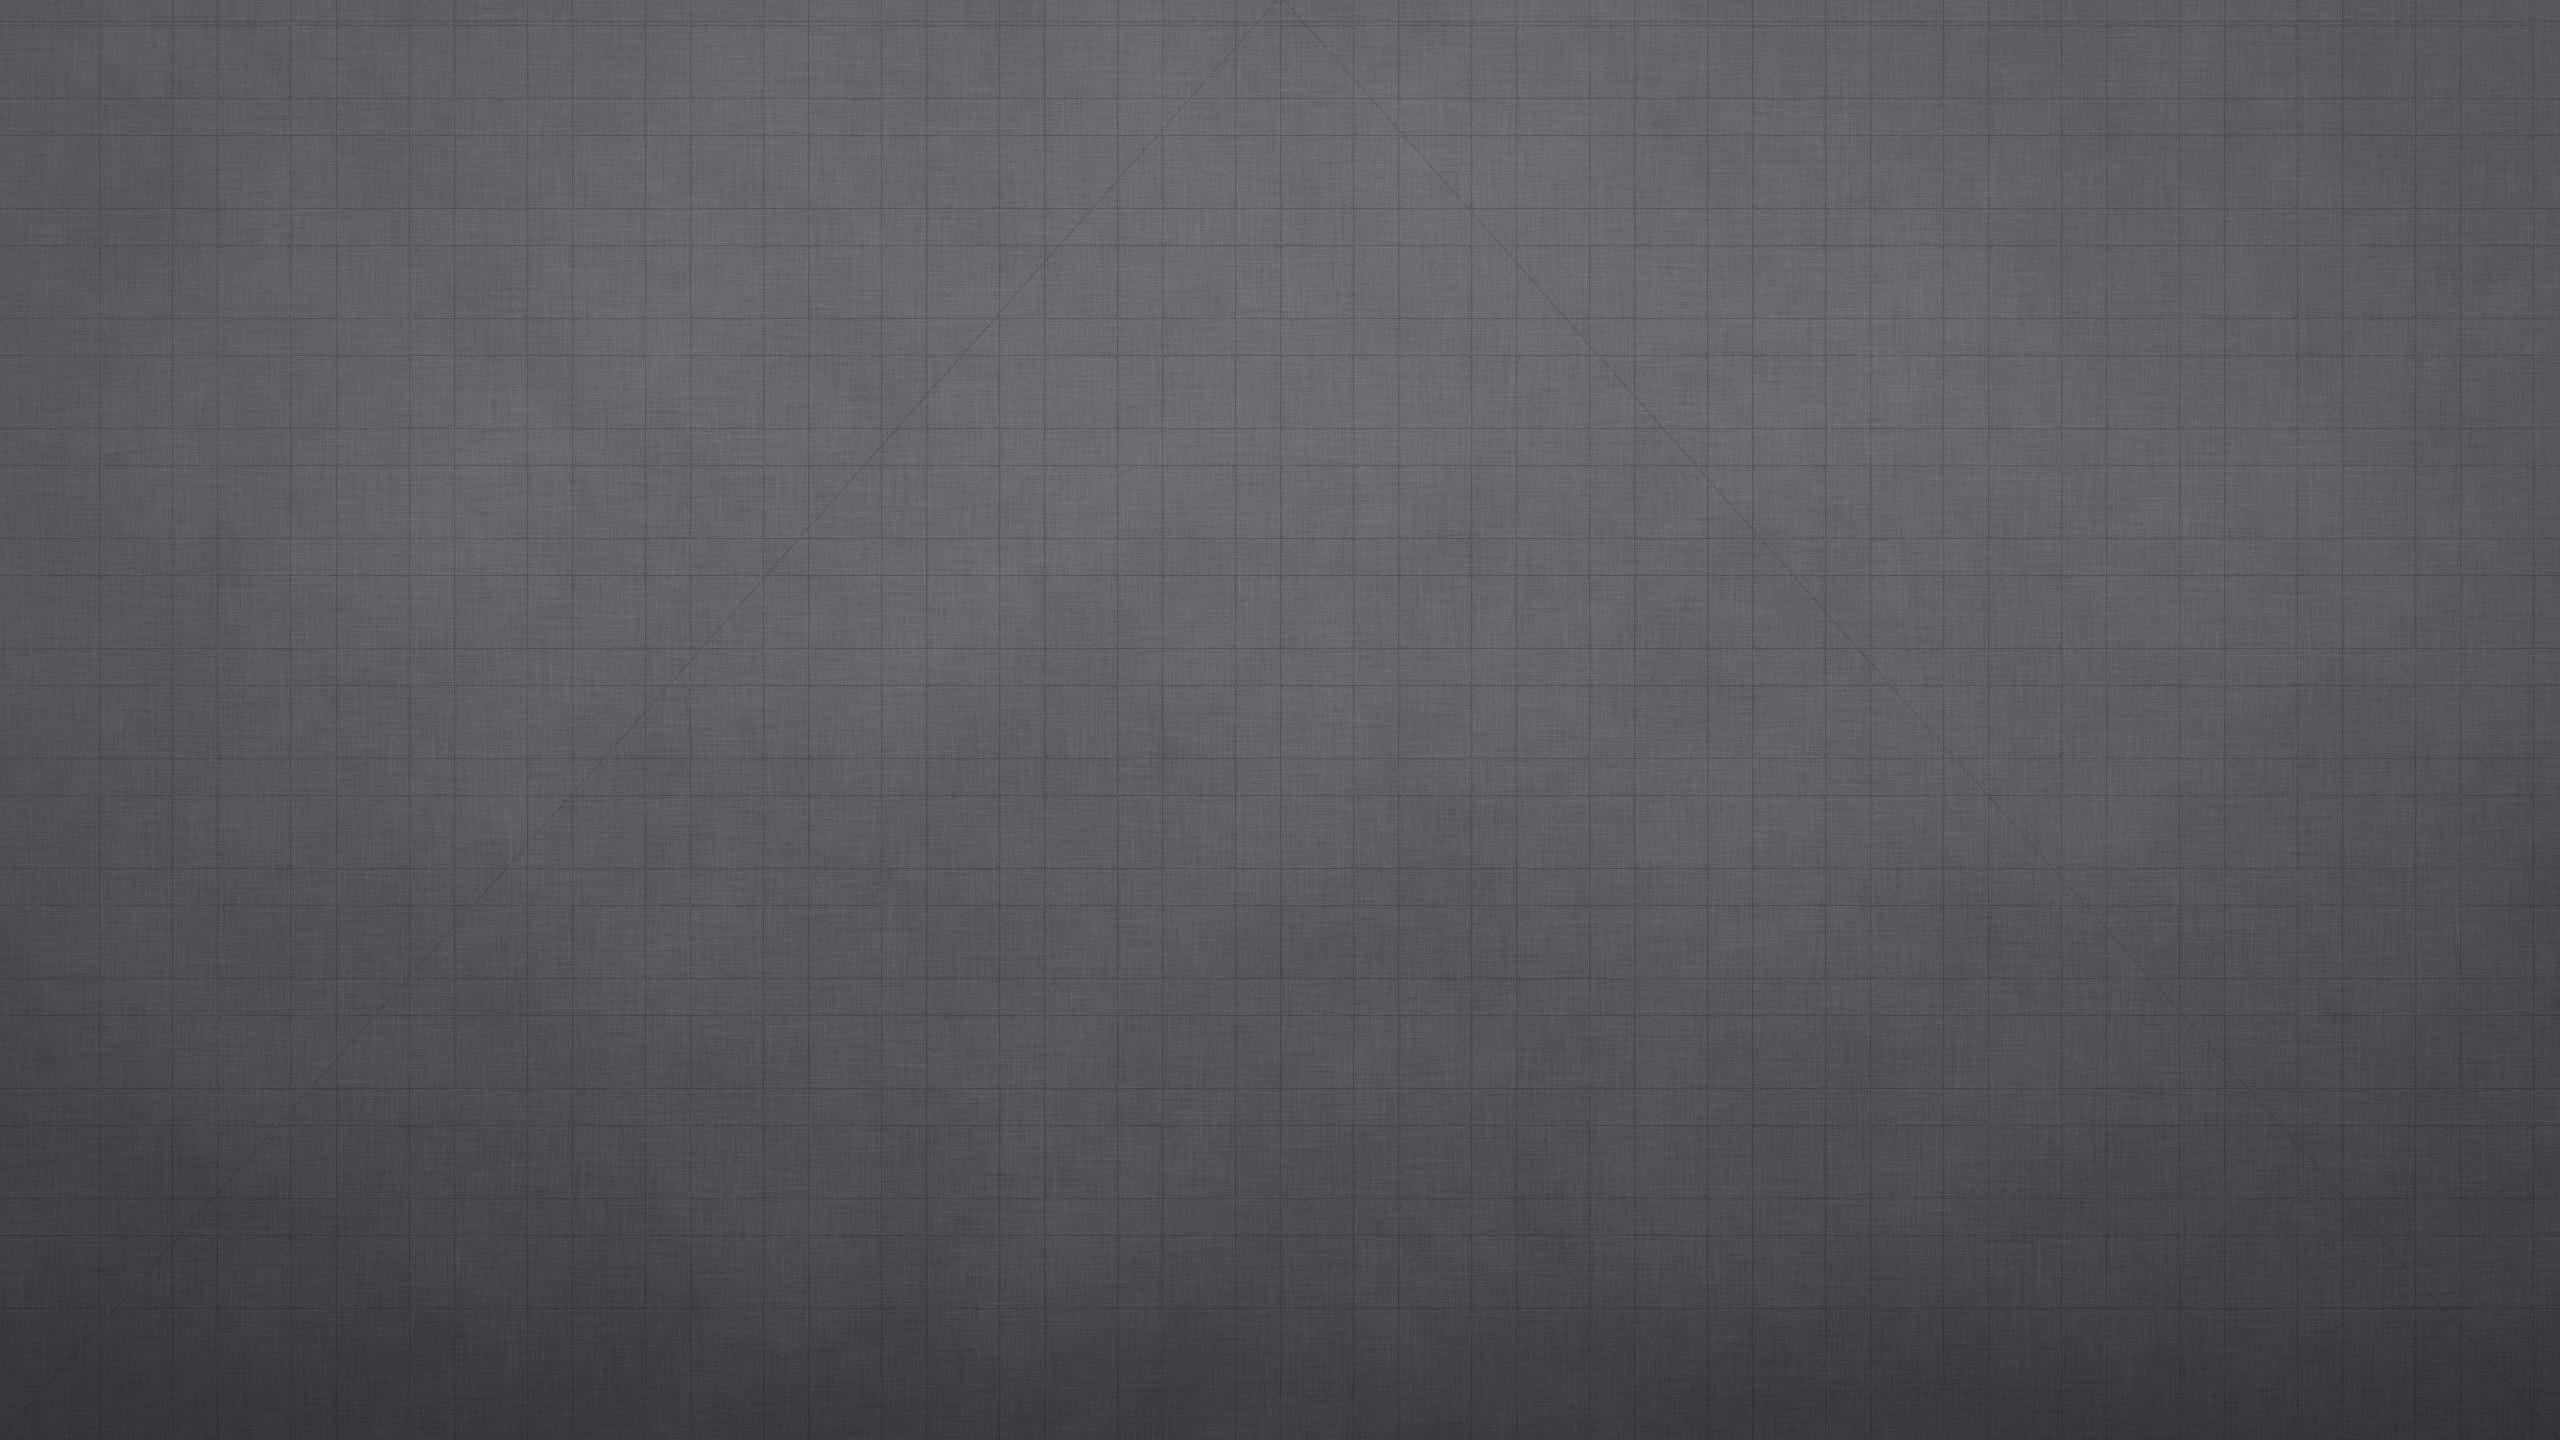 Res: 2560x1440, 2560 x 1440 Mac OSX Lion Mission Control Grid Wallpaper